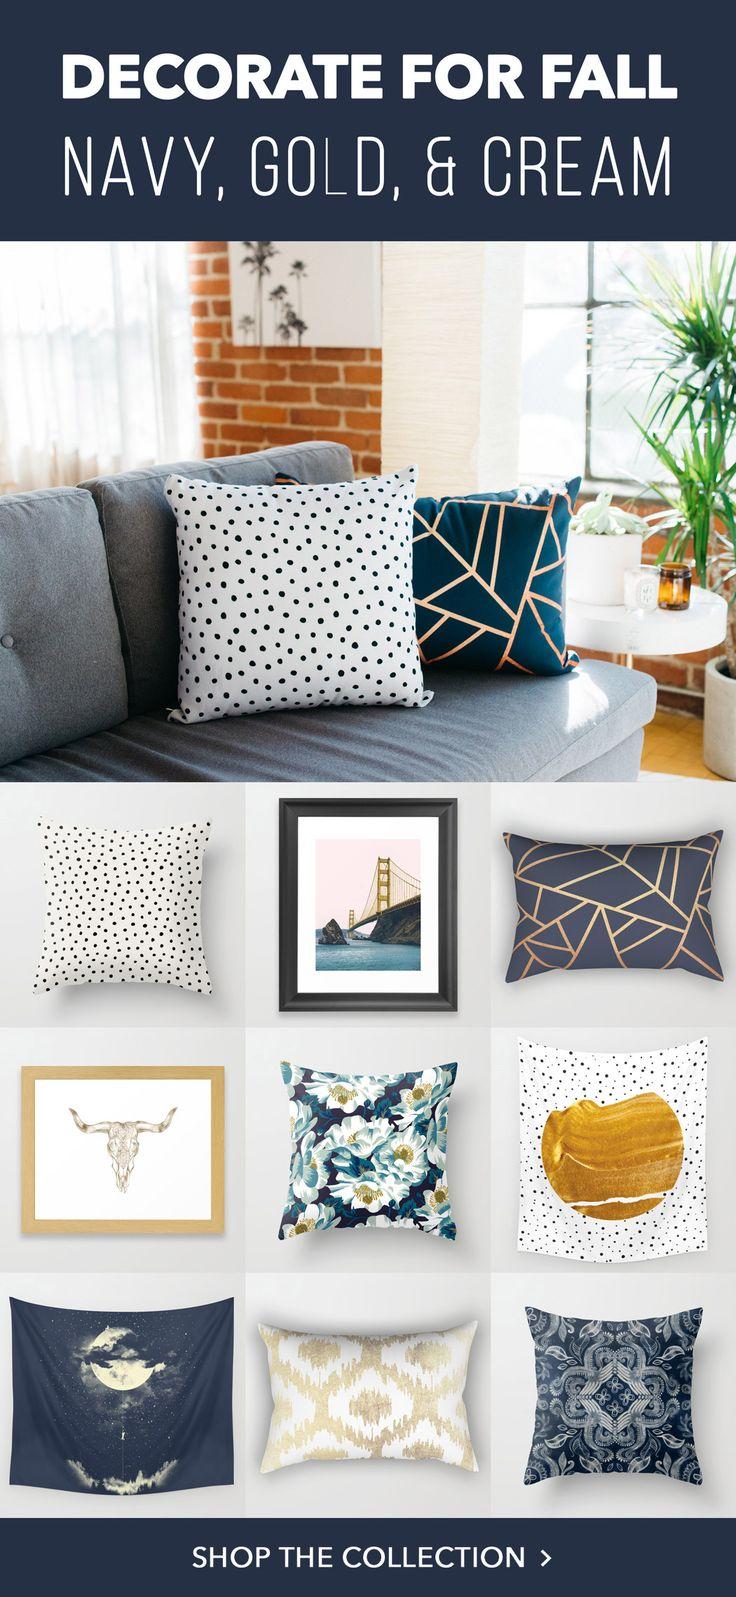 Bulk Throw Blankets Alluring 22 Best Createdads Bulk Editor 10122017 235621 Images On Decorating Inspiration